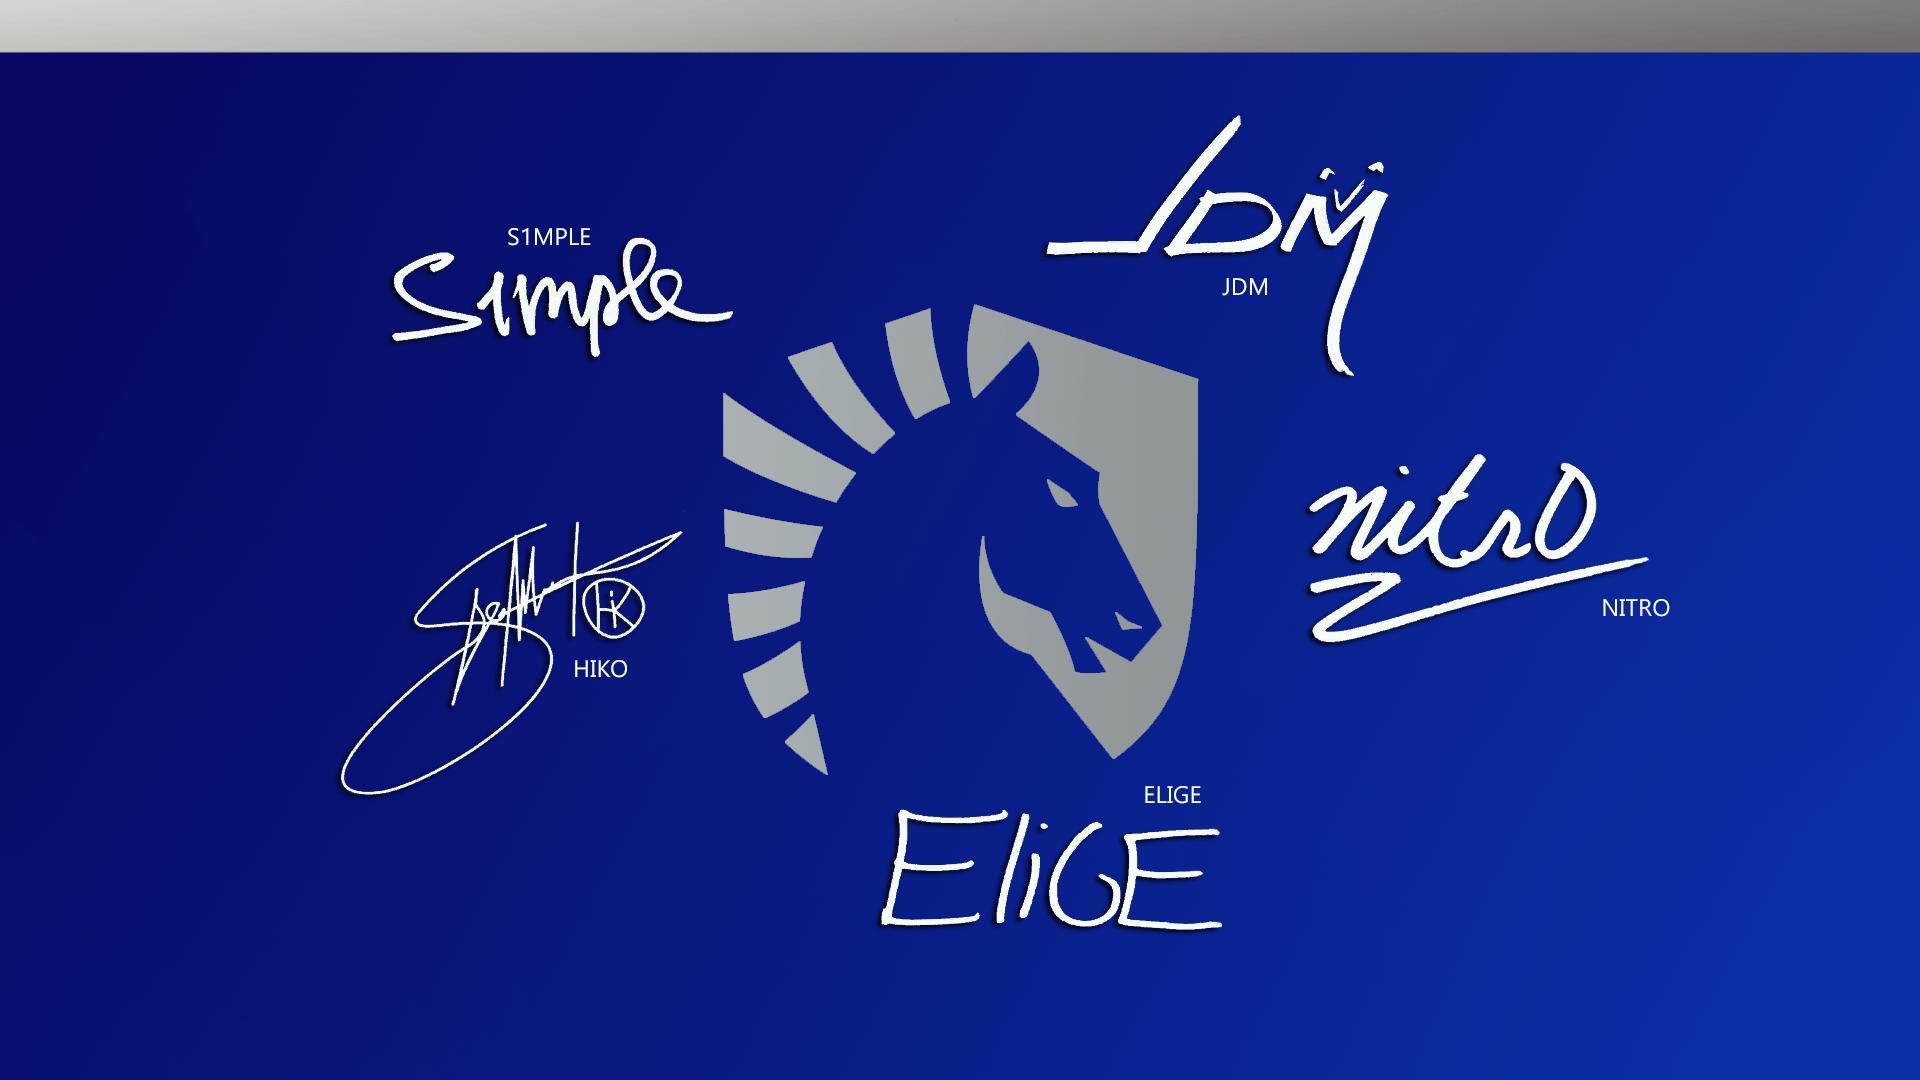 Team Liquid Wallpapers Top Free Team Liquid Backgrounds